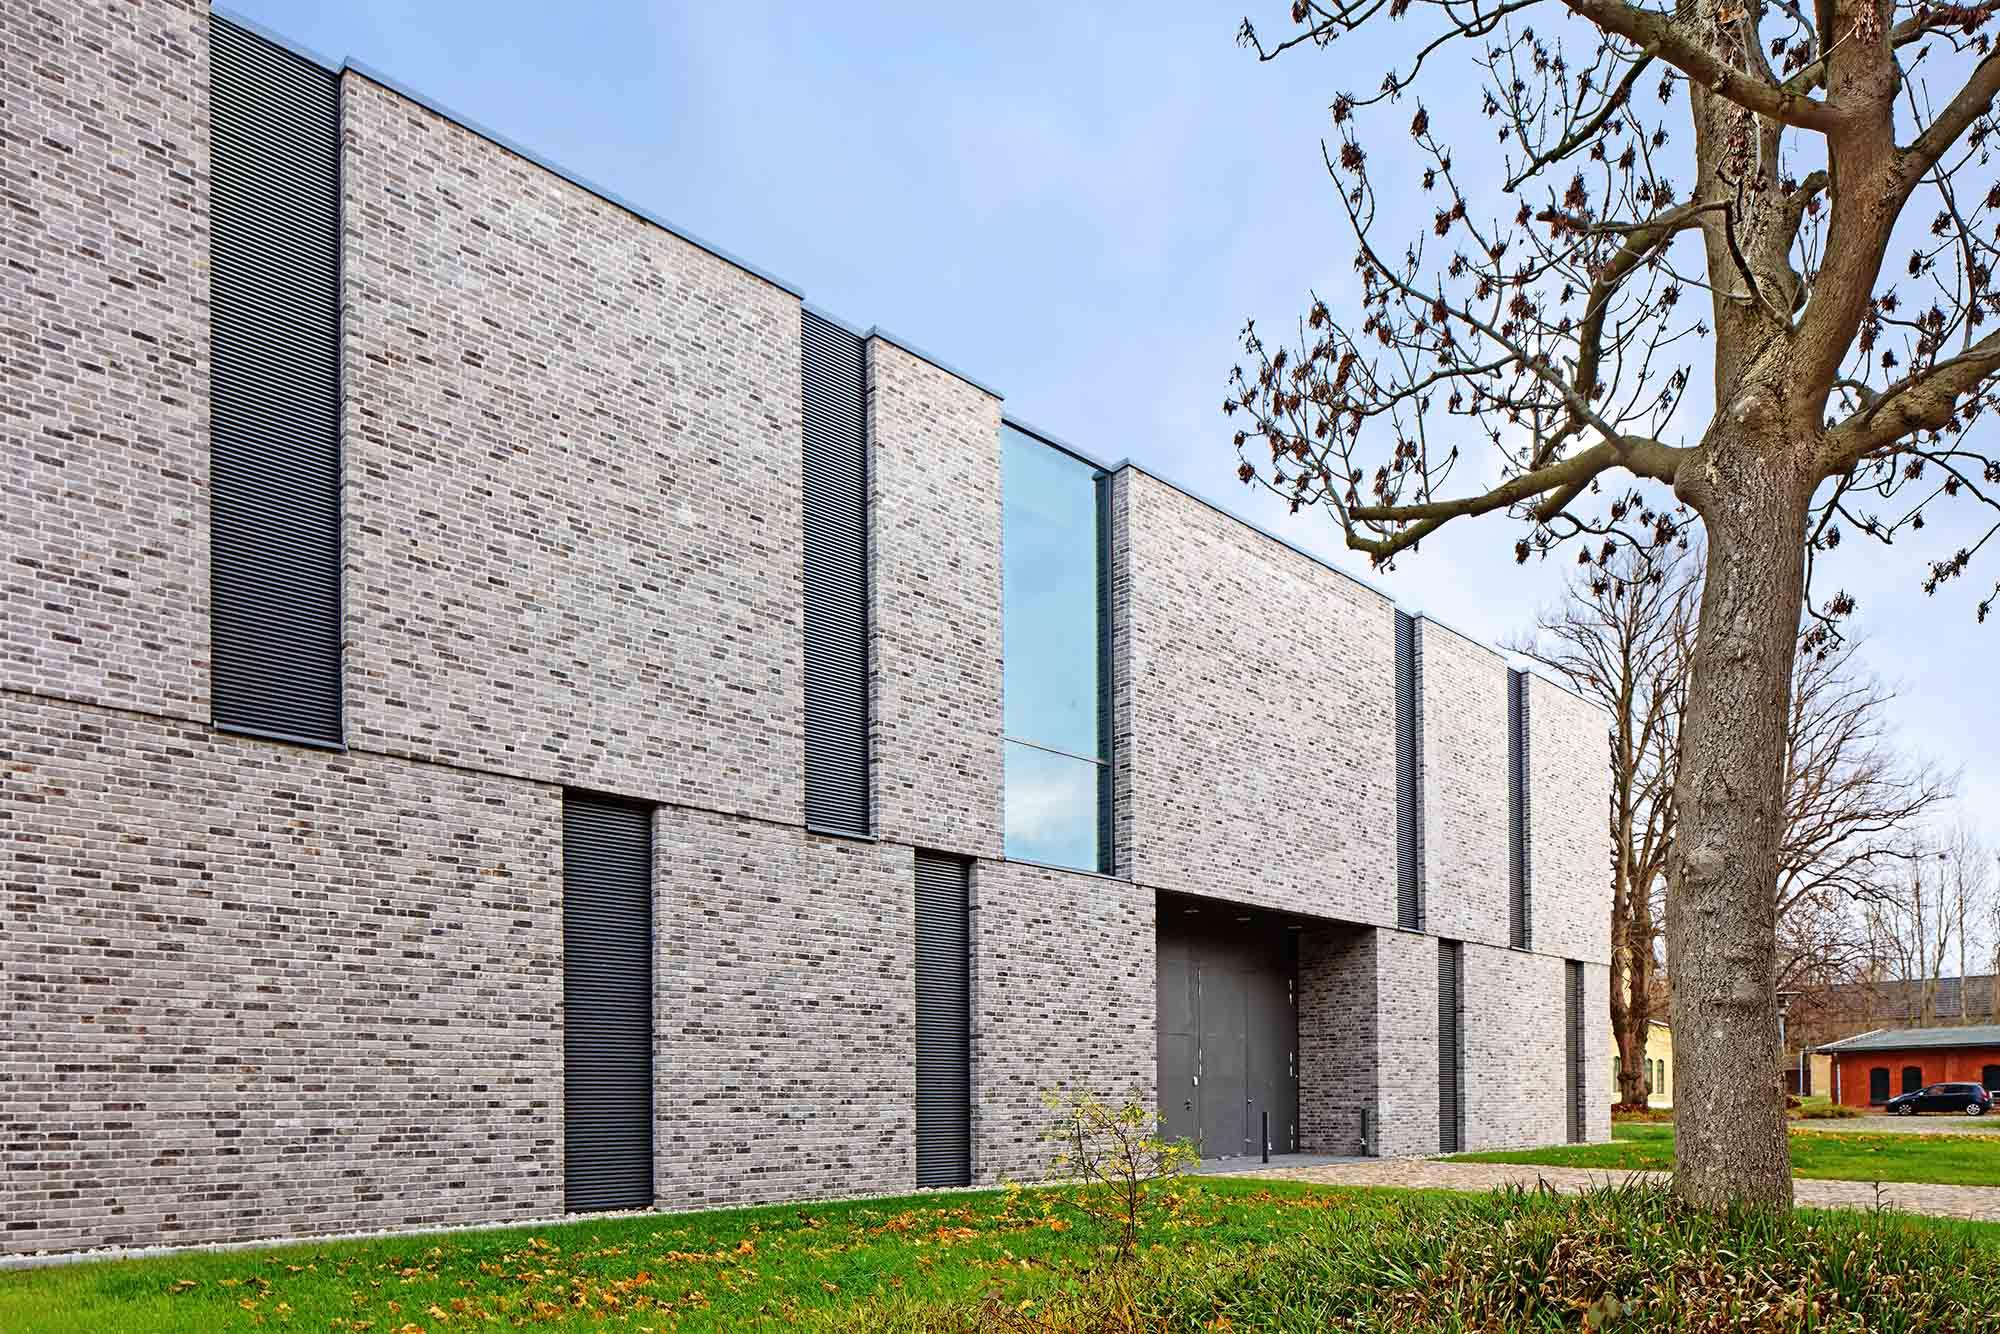 Magazingebäude Hesterberg Schleswig